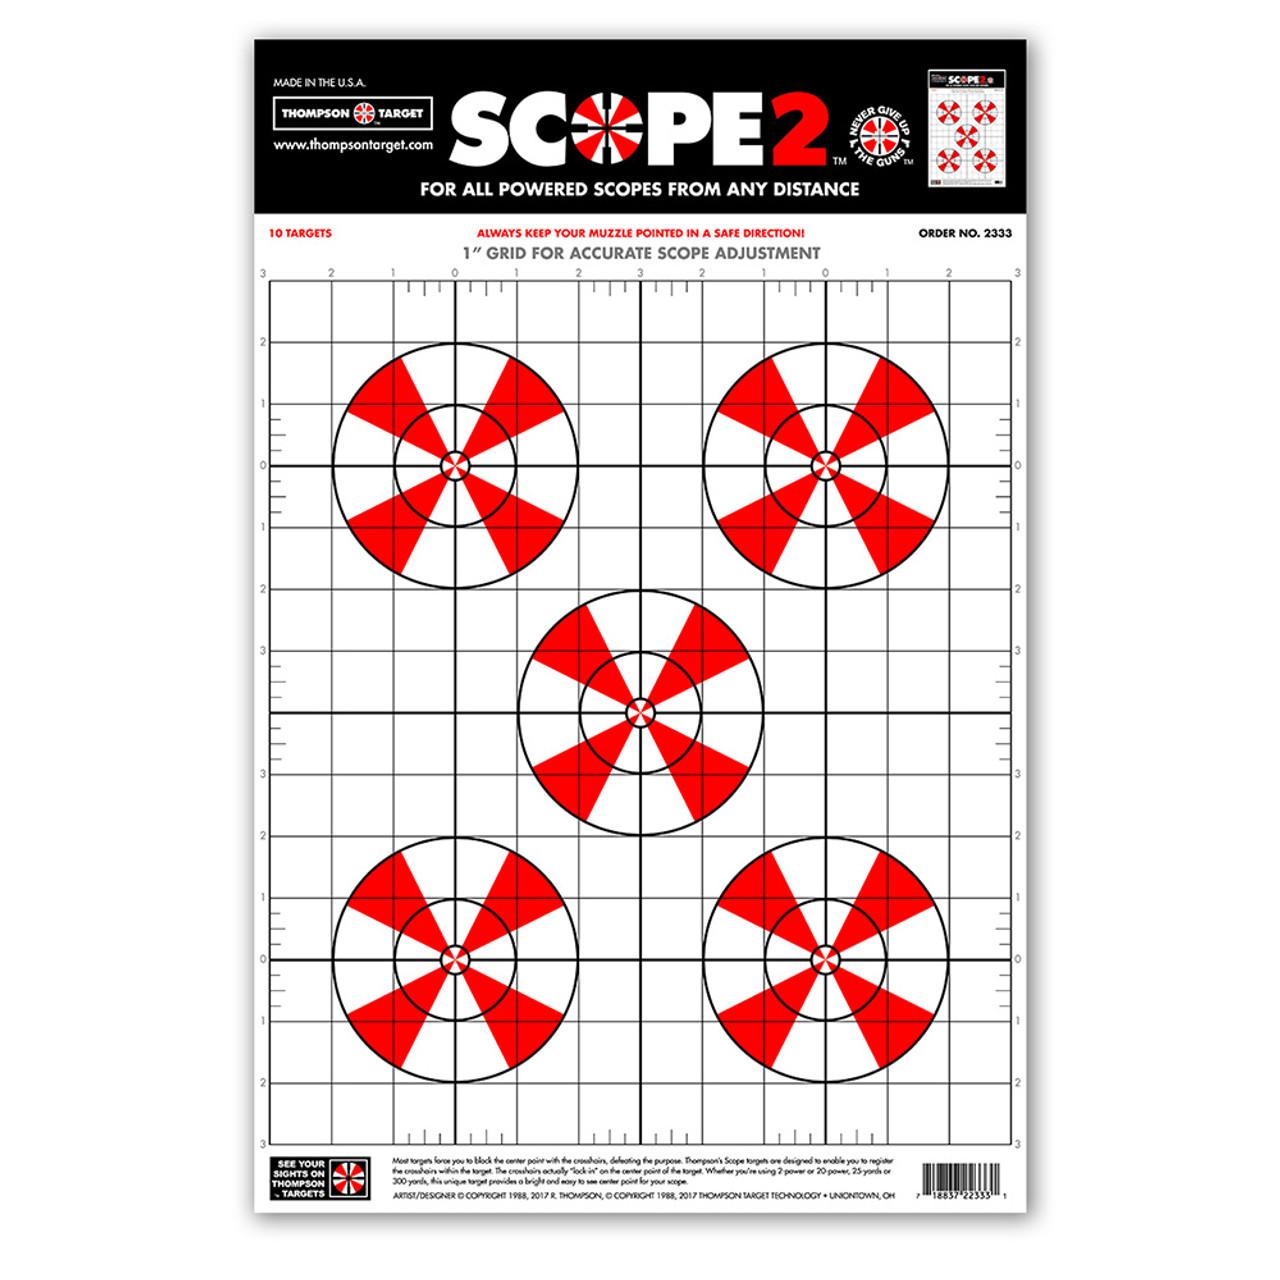 Scope 2 Sight-In 12 5